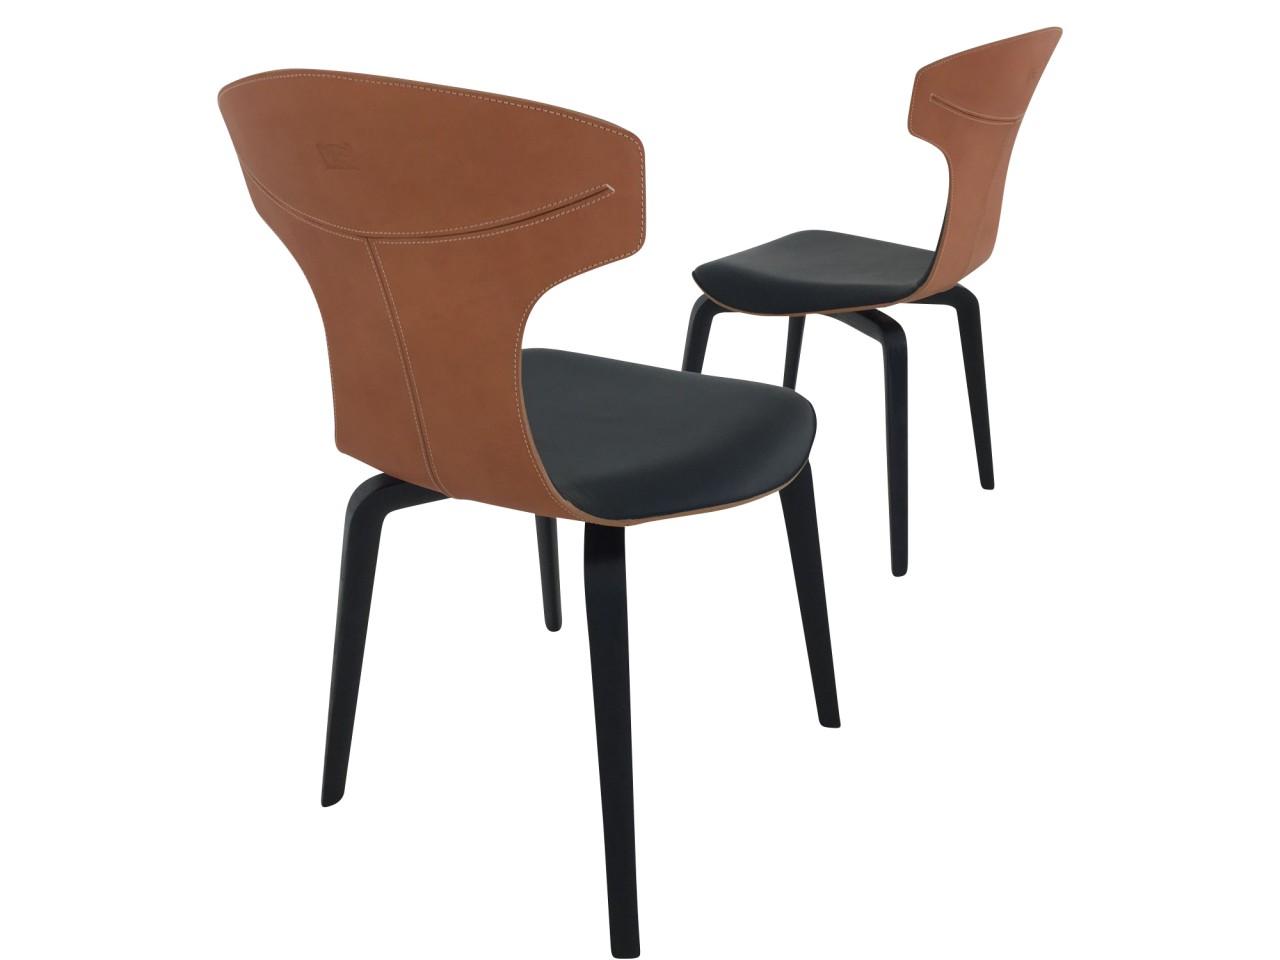 Poltrona Frau MONTERA 2 Stühle im saddle extra Kernleder camello und Leder SC africa nero